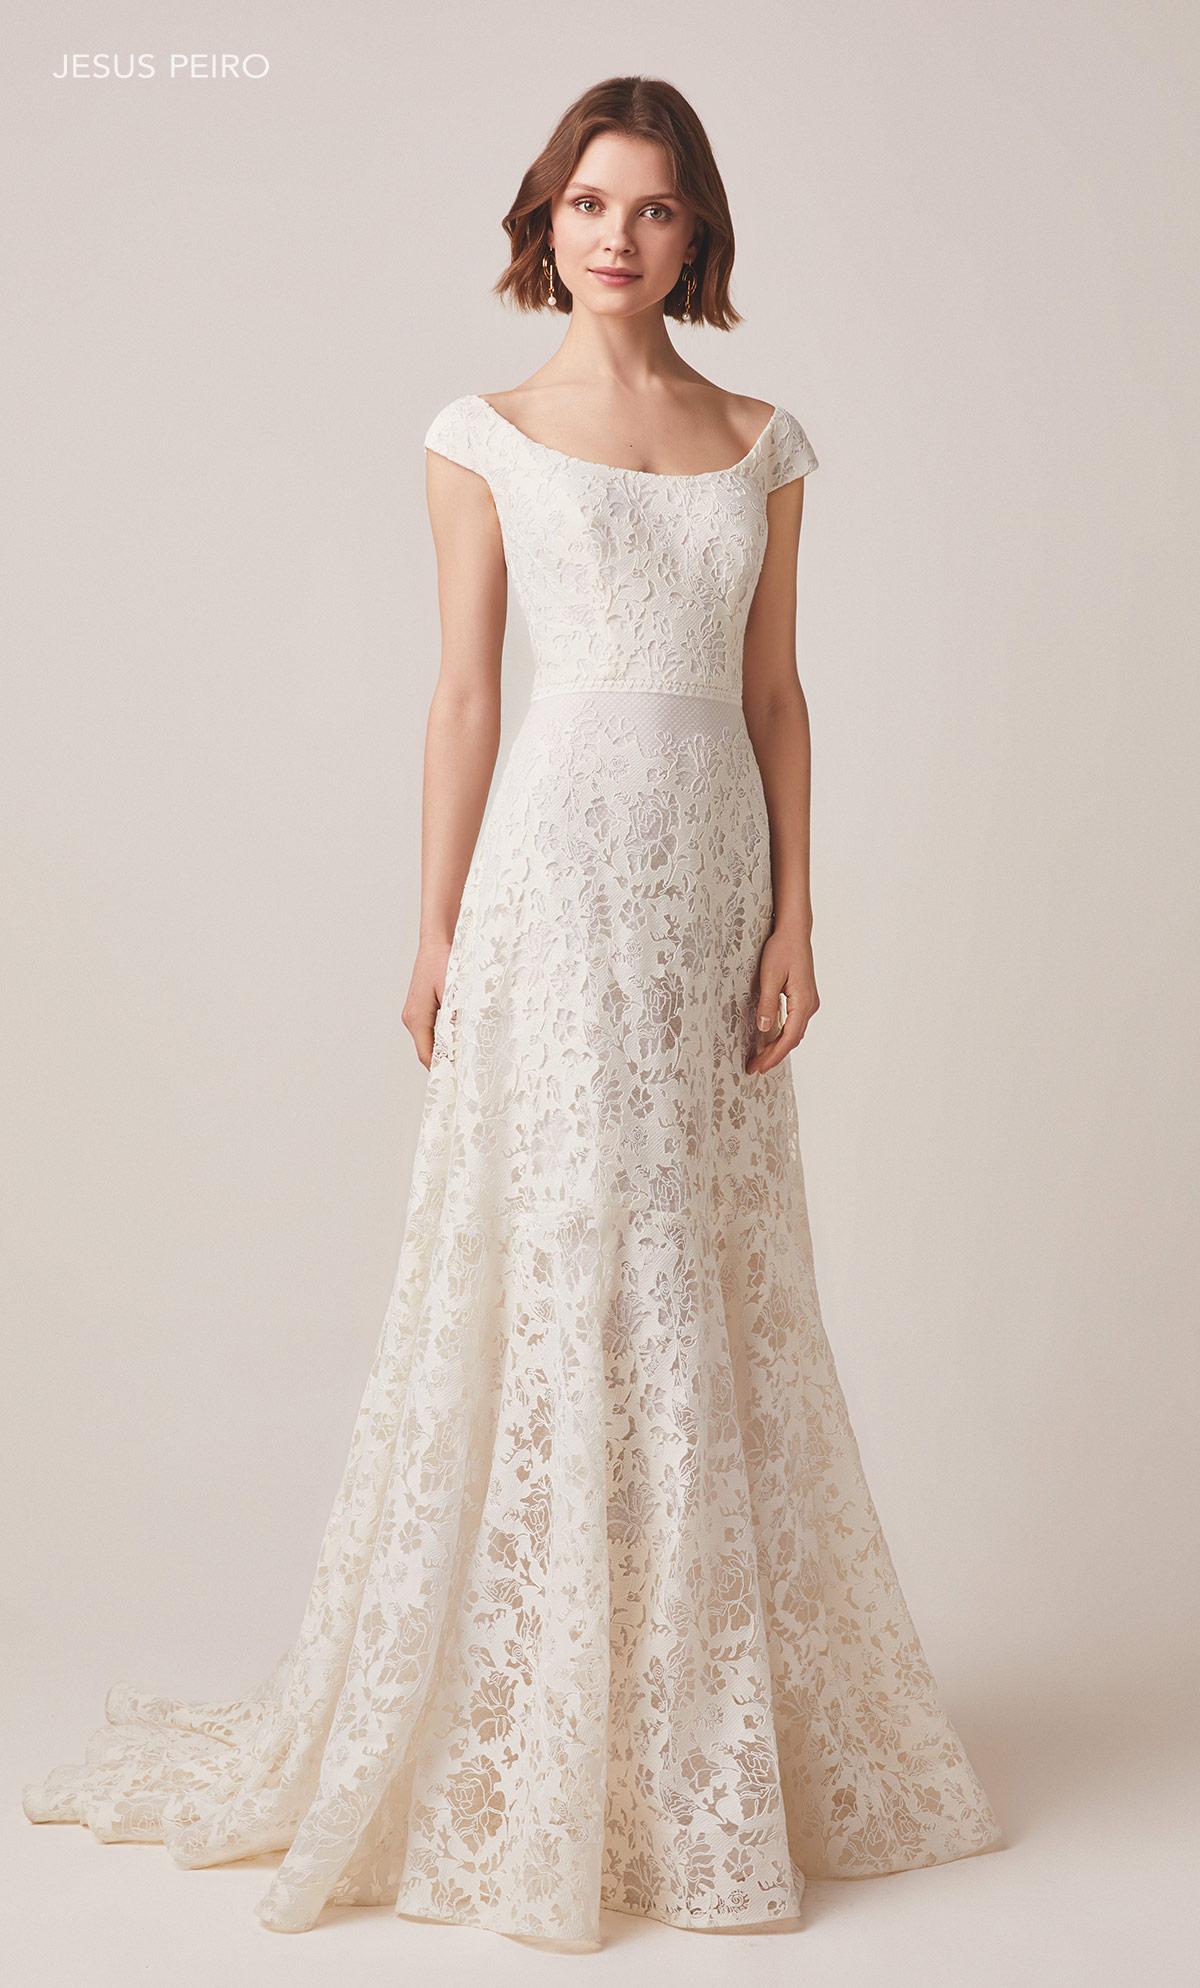 Vestido novia Jesús Peiró Ref.147